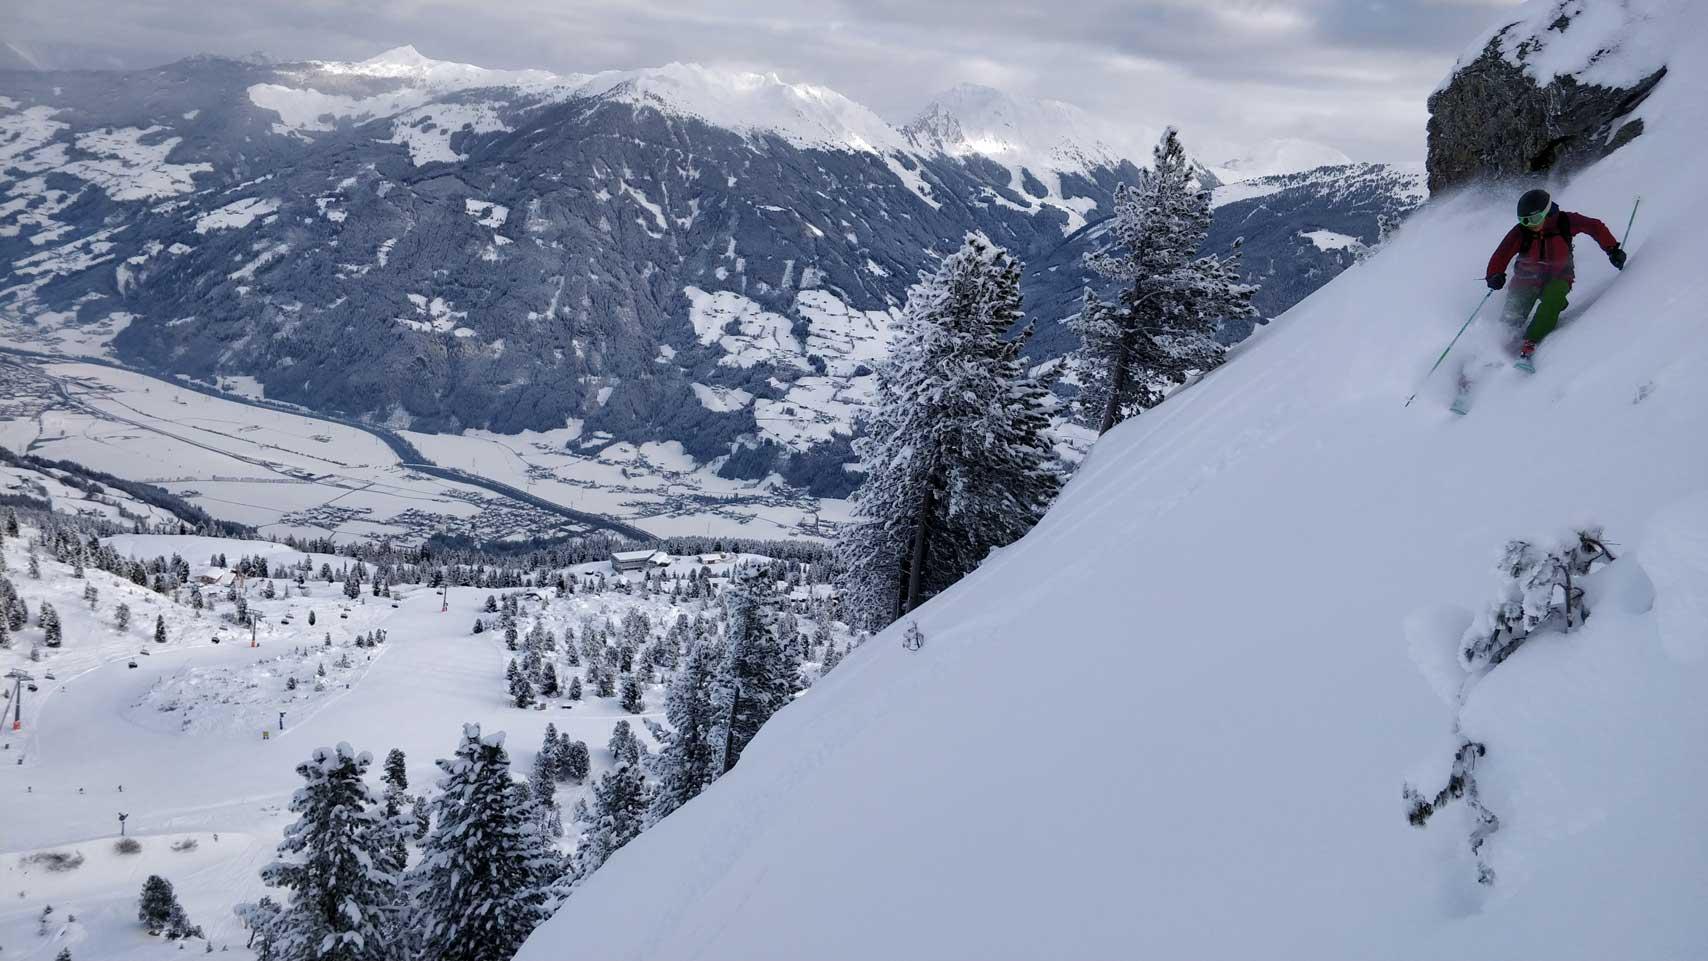 hochzillertal-ski-Ada-Jaszczynska-munichmountaingirls